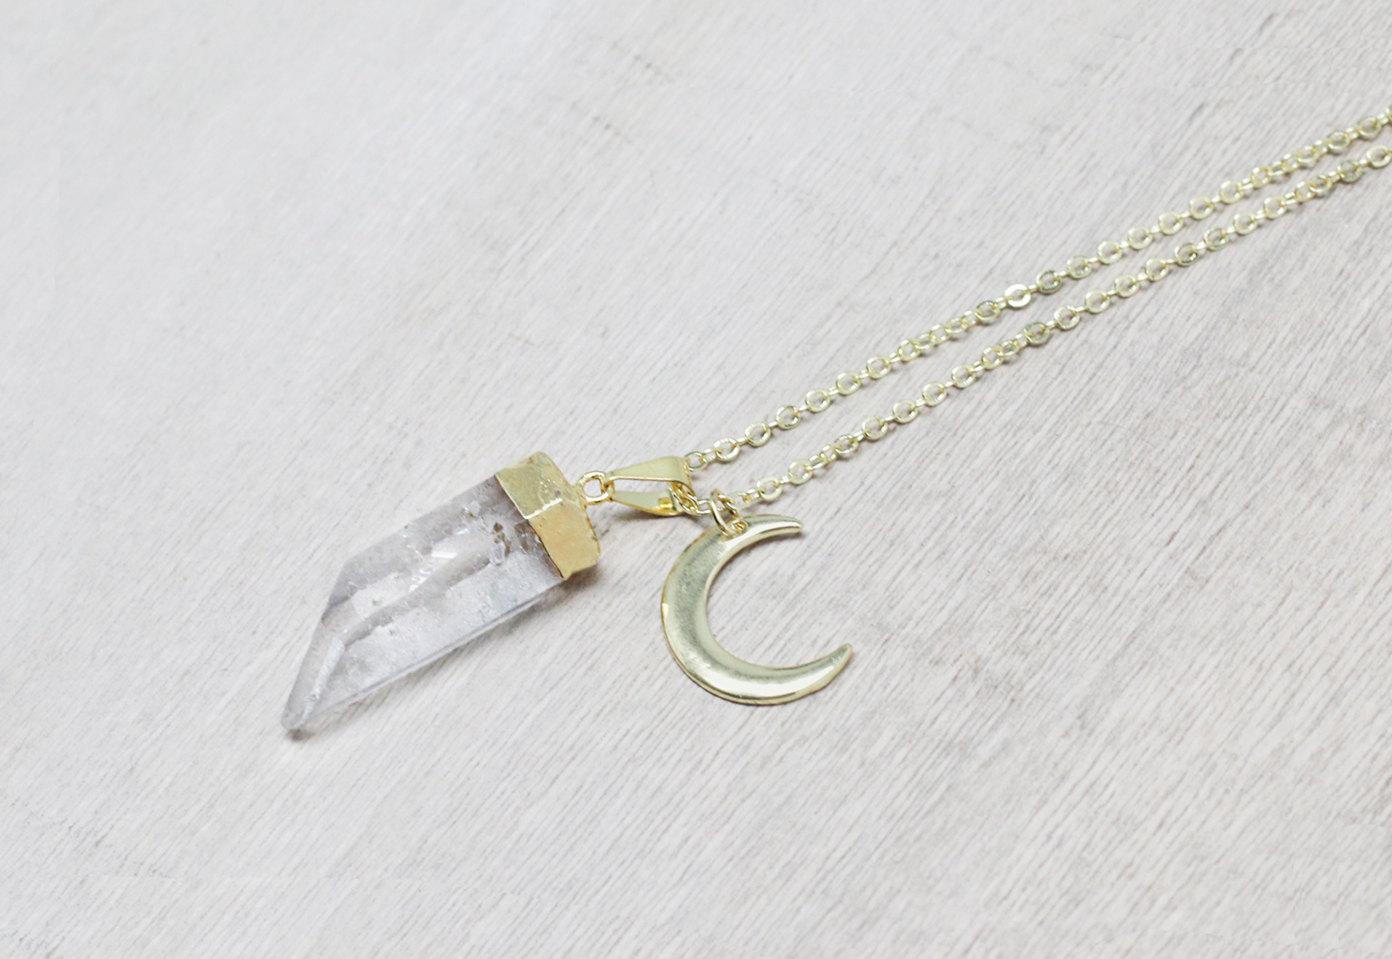 Crescent Moon Quartz Pendant Necklace / gold plated raw quartz necklace / 0665